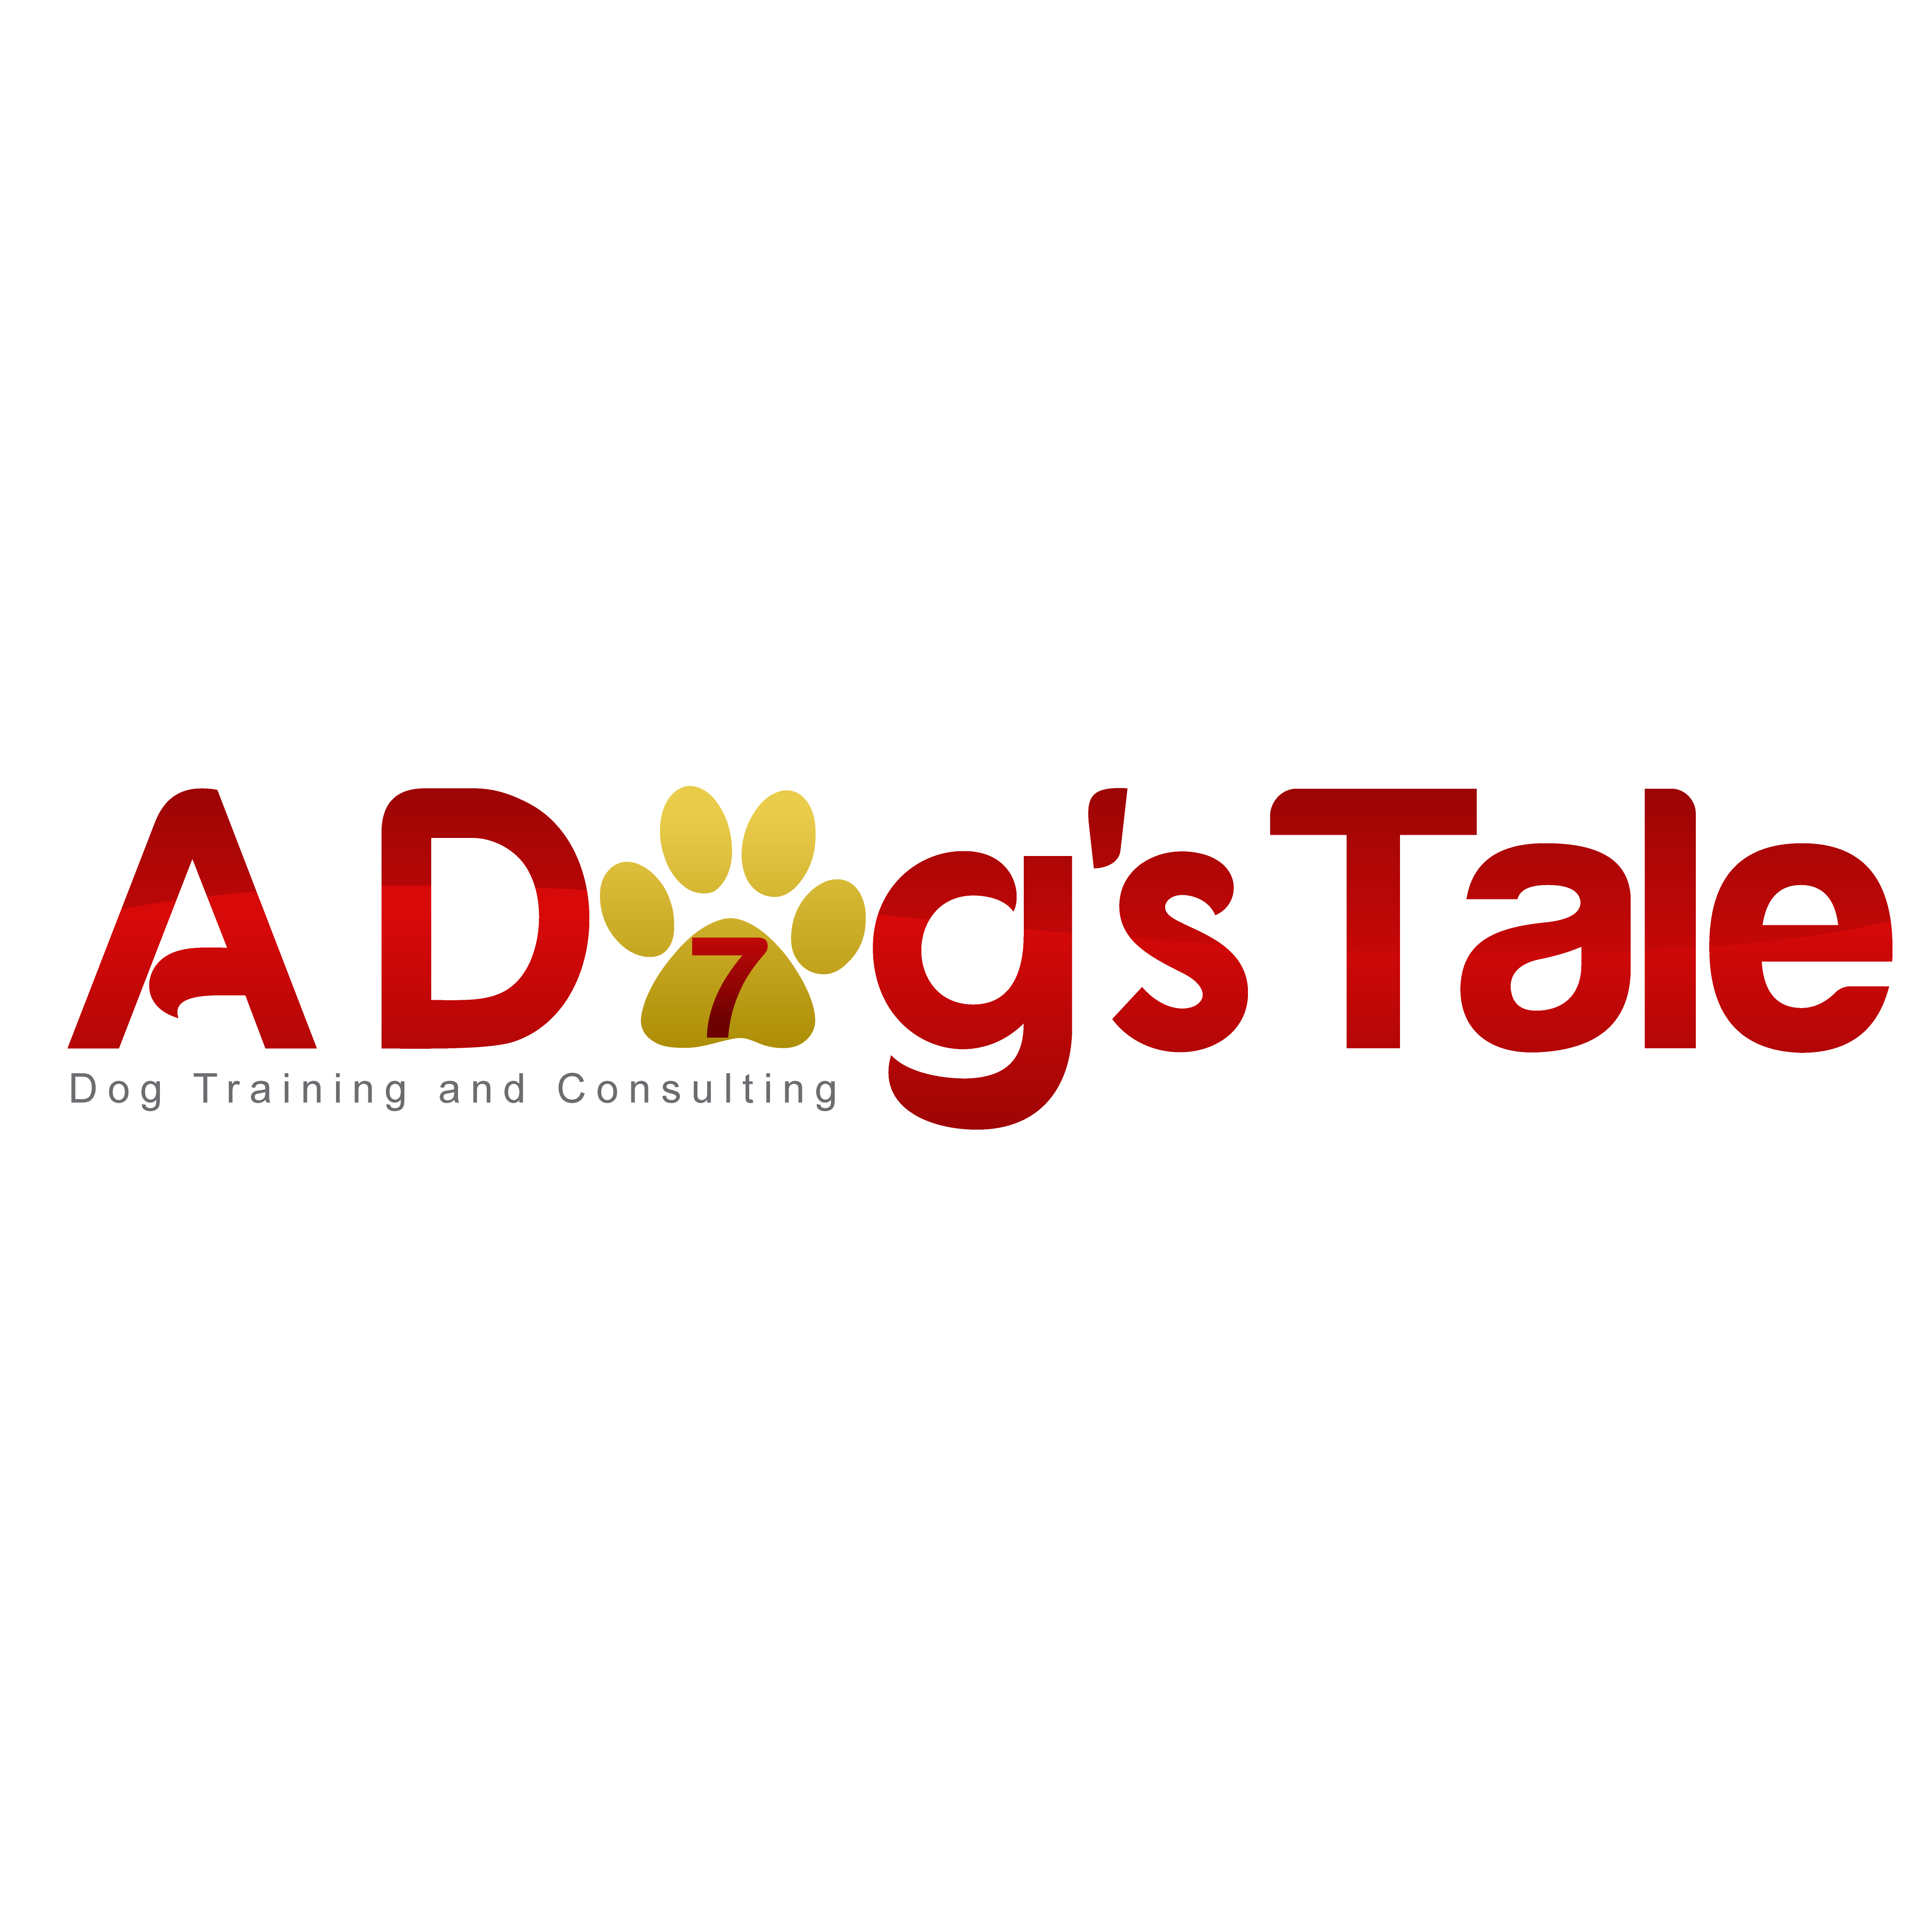 A Dog's Tale Dog Training - Ewa Beach, HI 96706 - (808)201-2009   ShowMeLocal.com